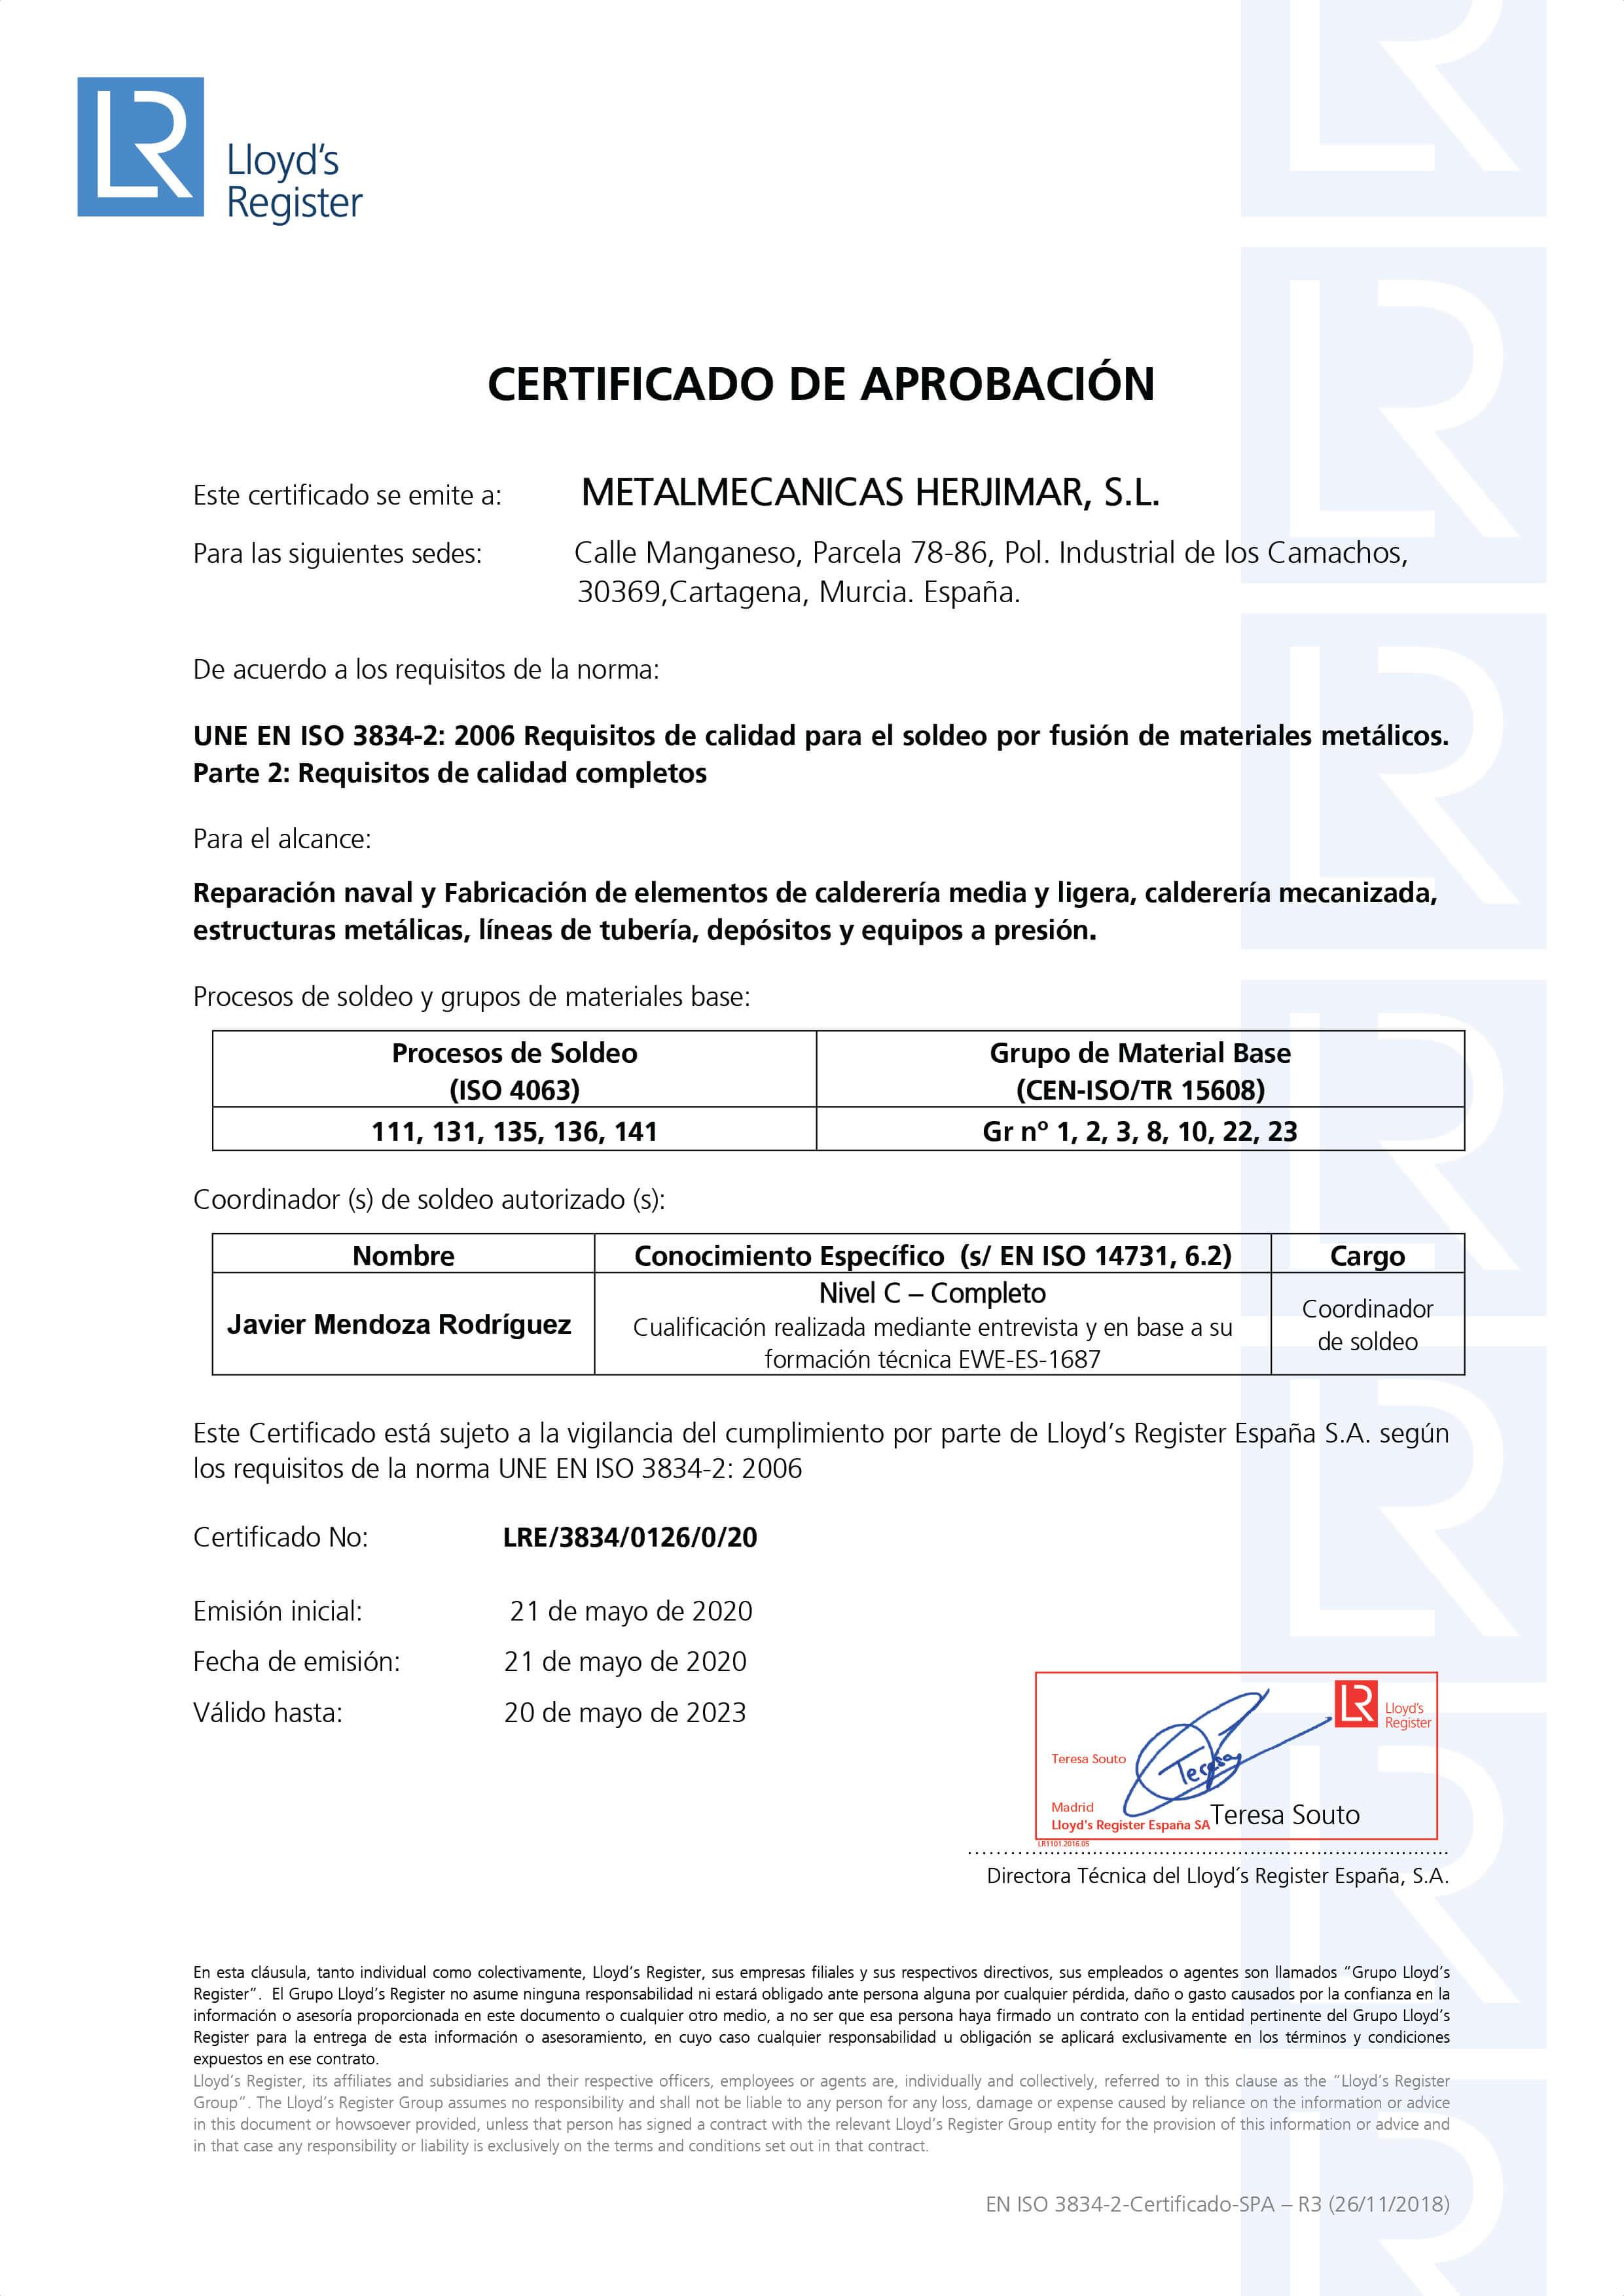 M HERJIMAR 3834-Certificate-R0_SPA (1)